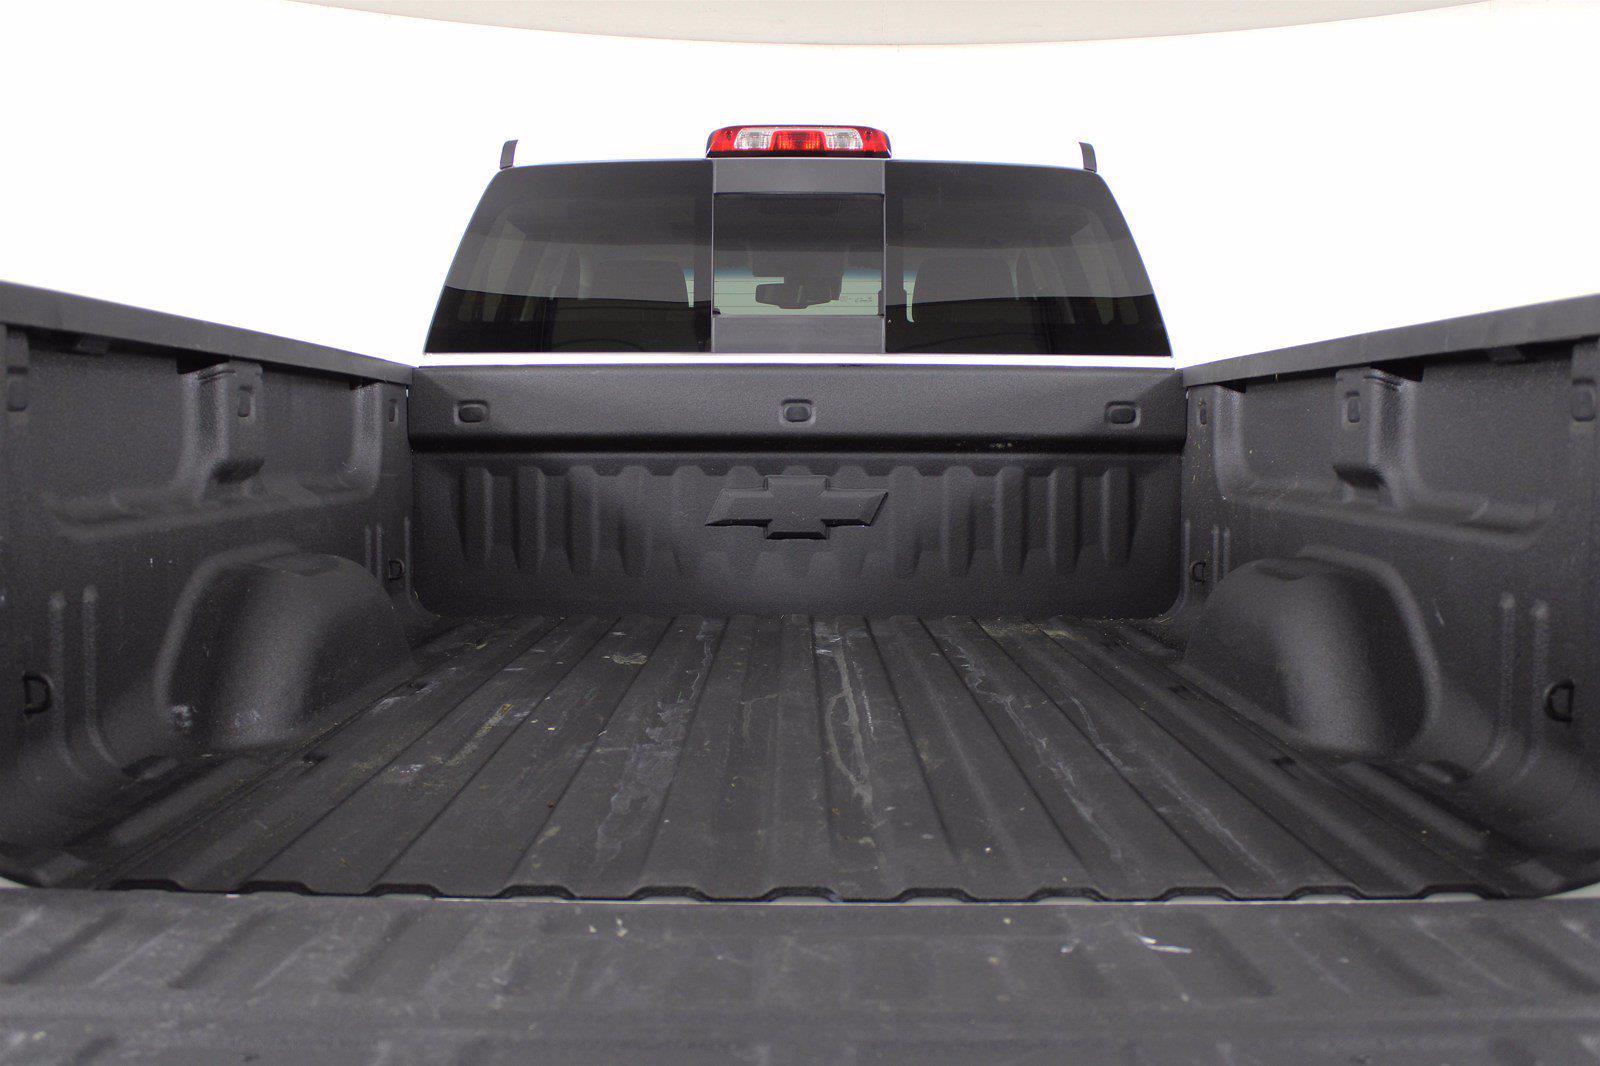 2019 Chevrolet Silverado 2500 Crew Cab 4x4, Pickup #D110643A - photo 9